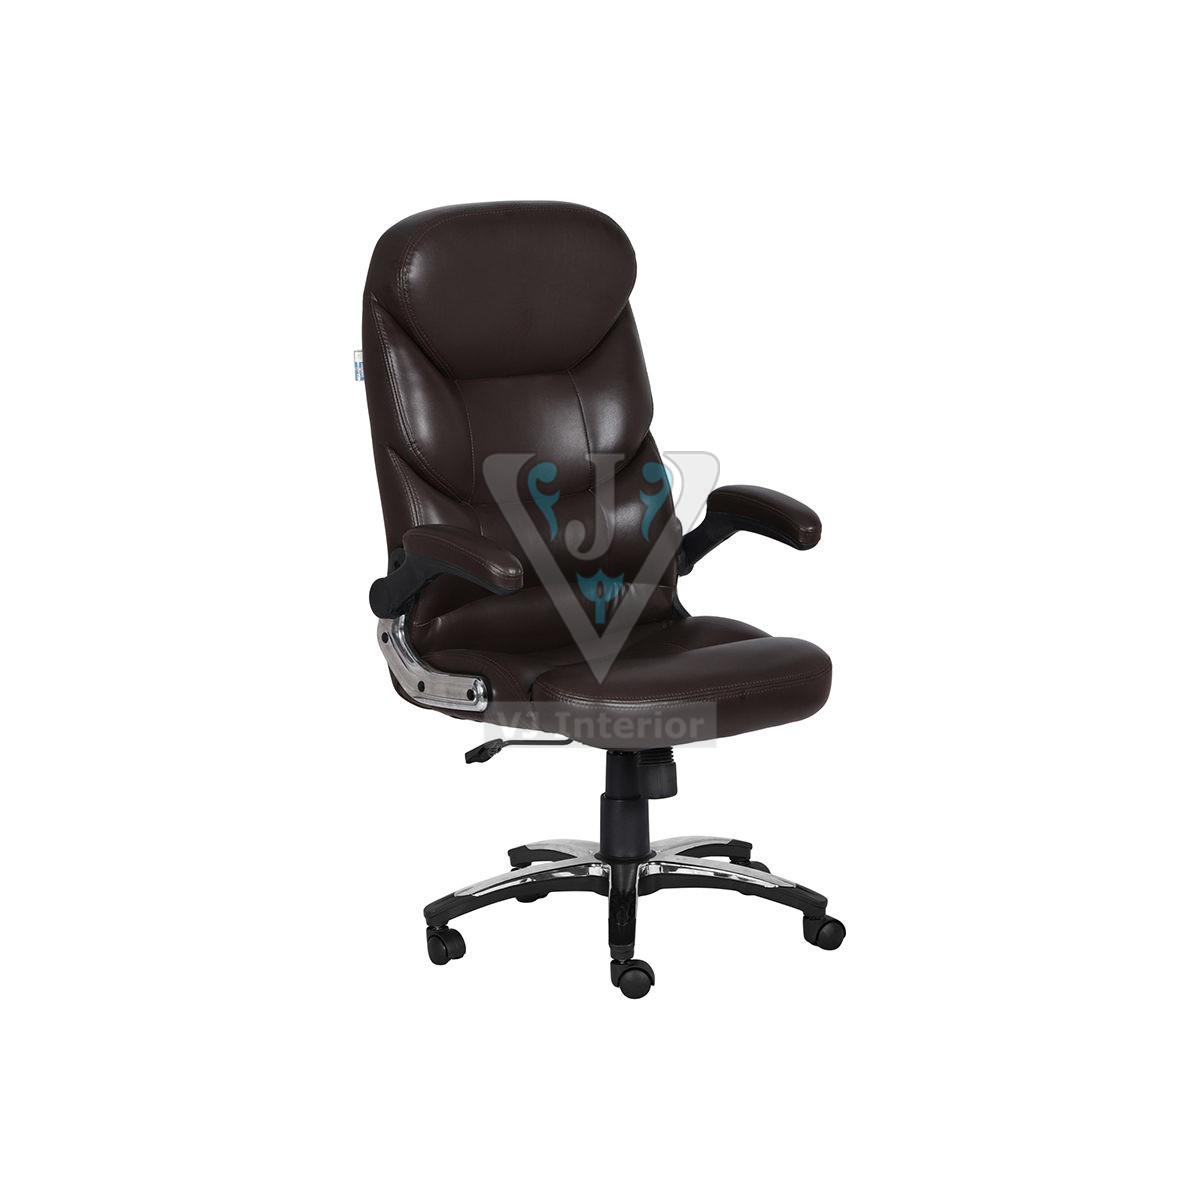 New Designer High Back Executive Chair